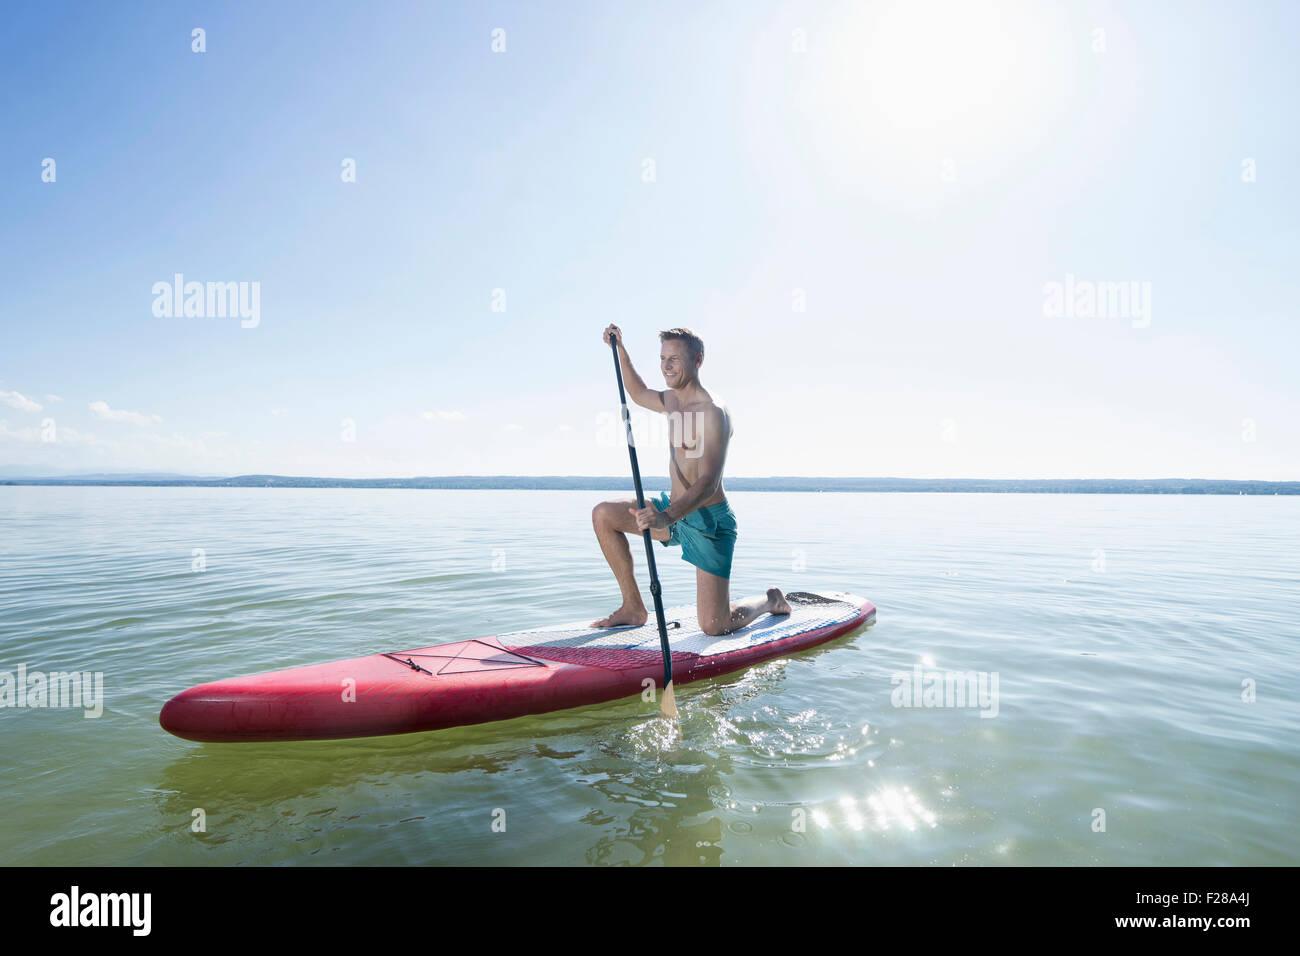 Mature man paddleboarding in the lake, Bavaria, Germany - Stock Image